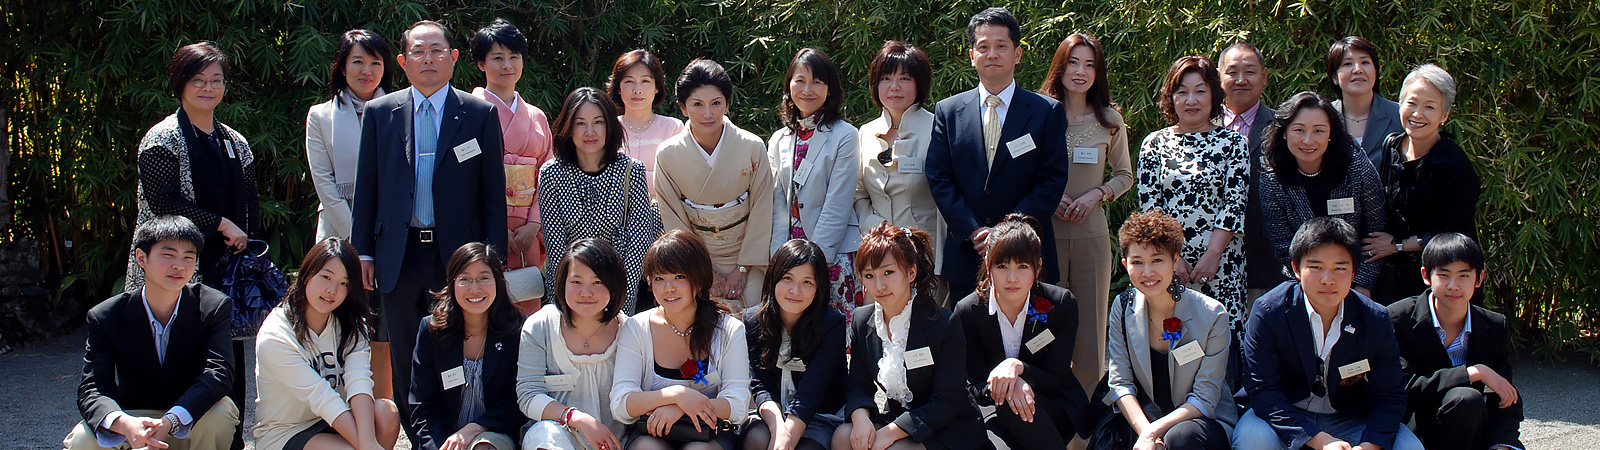 members-graduates-img4